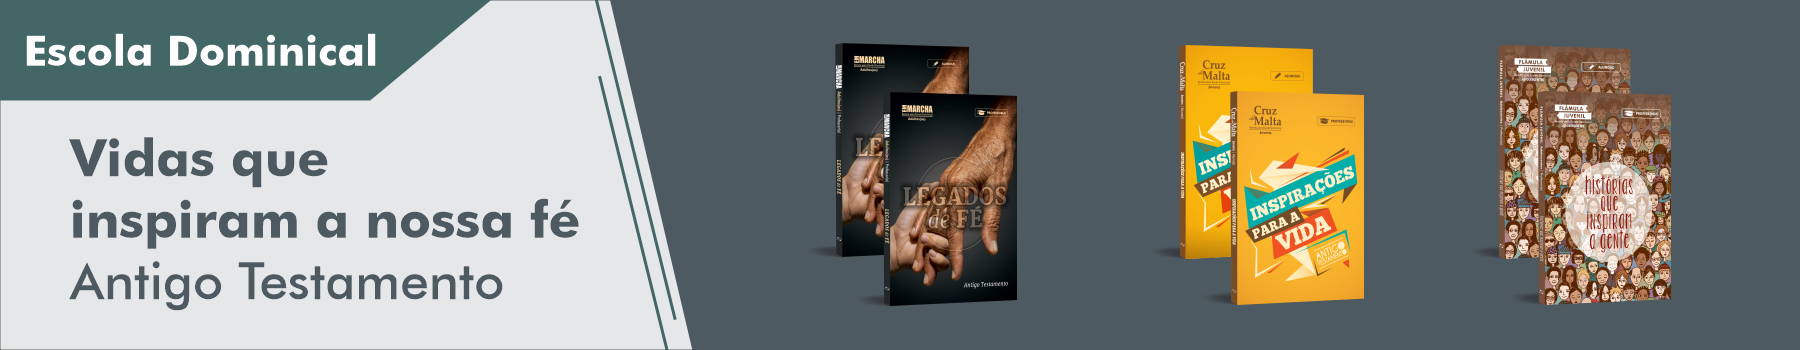 Escola Dominical, Vidas que inspiram - Antigo Testamento